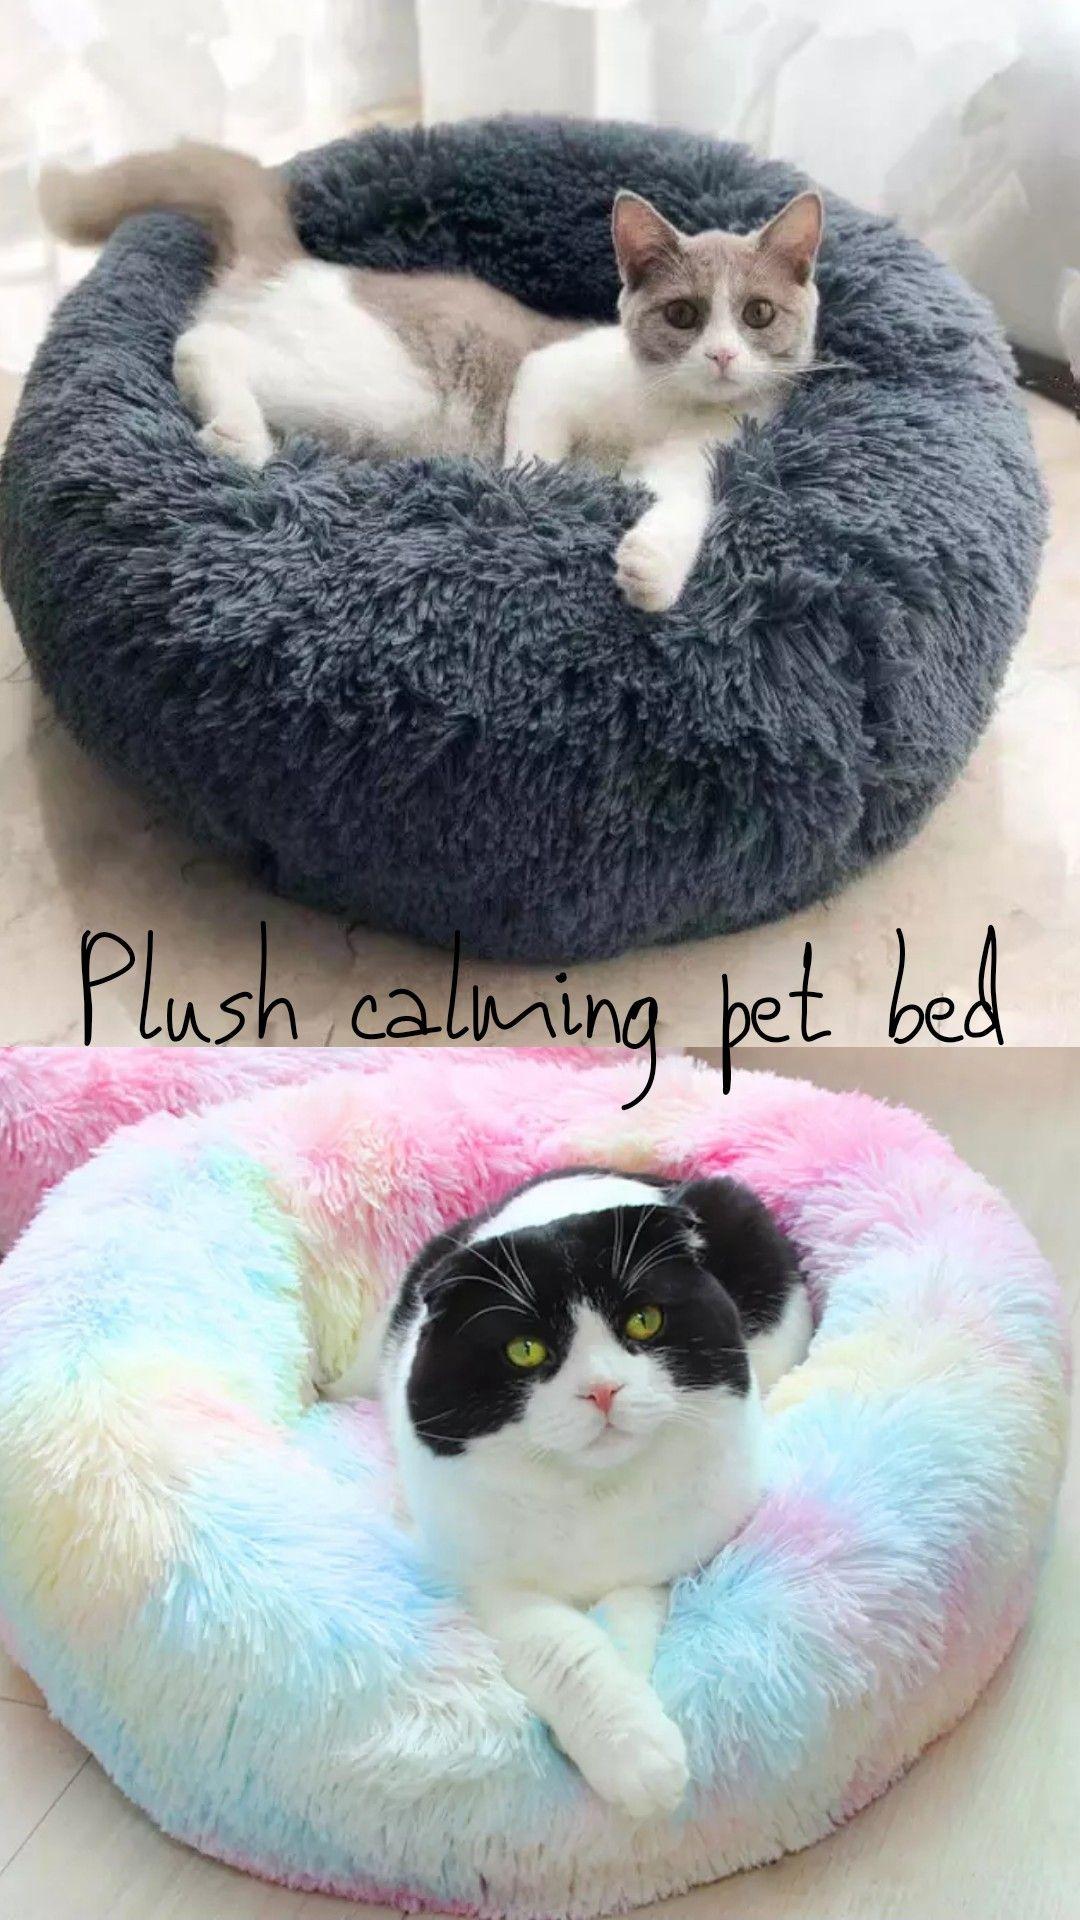 Snuggle Buddy Bed Dog bean bag, Cat leash, Plush pet bed